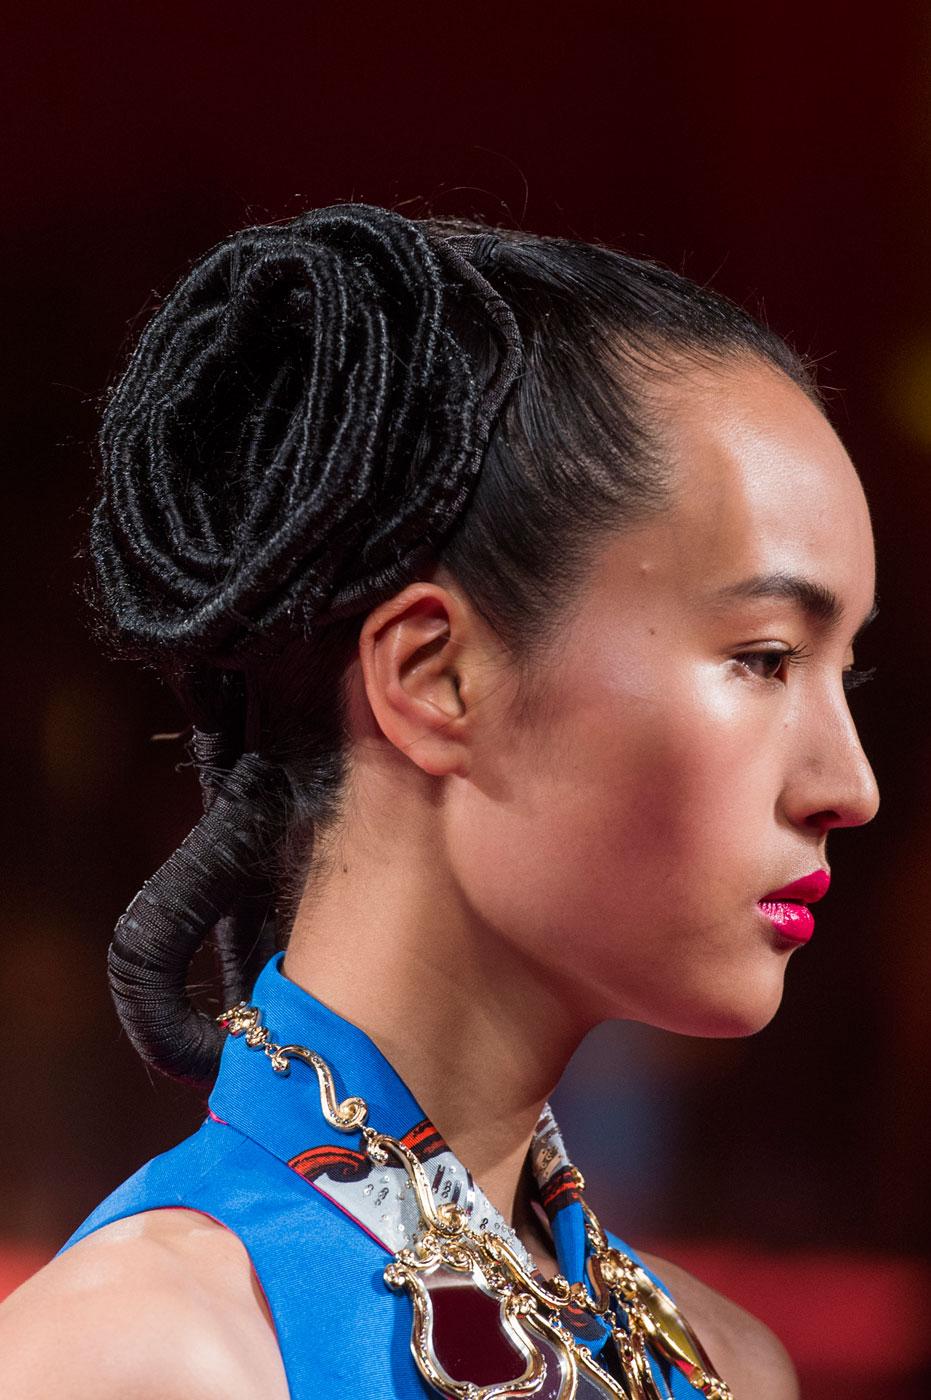 Schiaparelli-fashion-runway-show-close-ups-haute-couture-paris-spring-summer-2015-the-impression-43